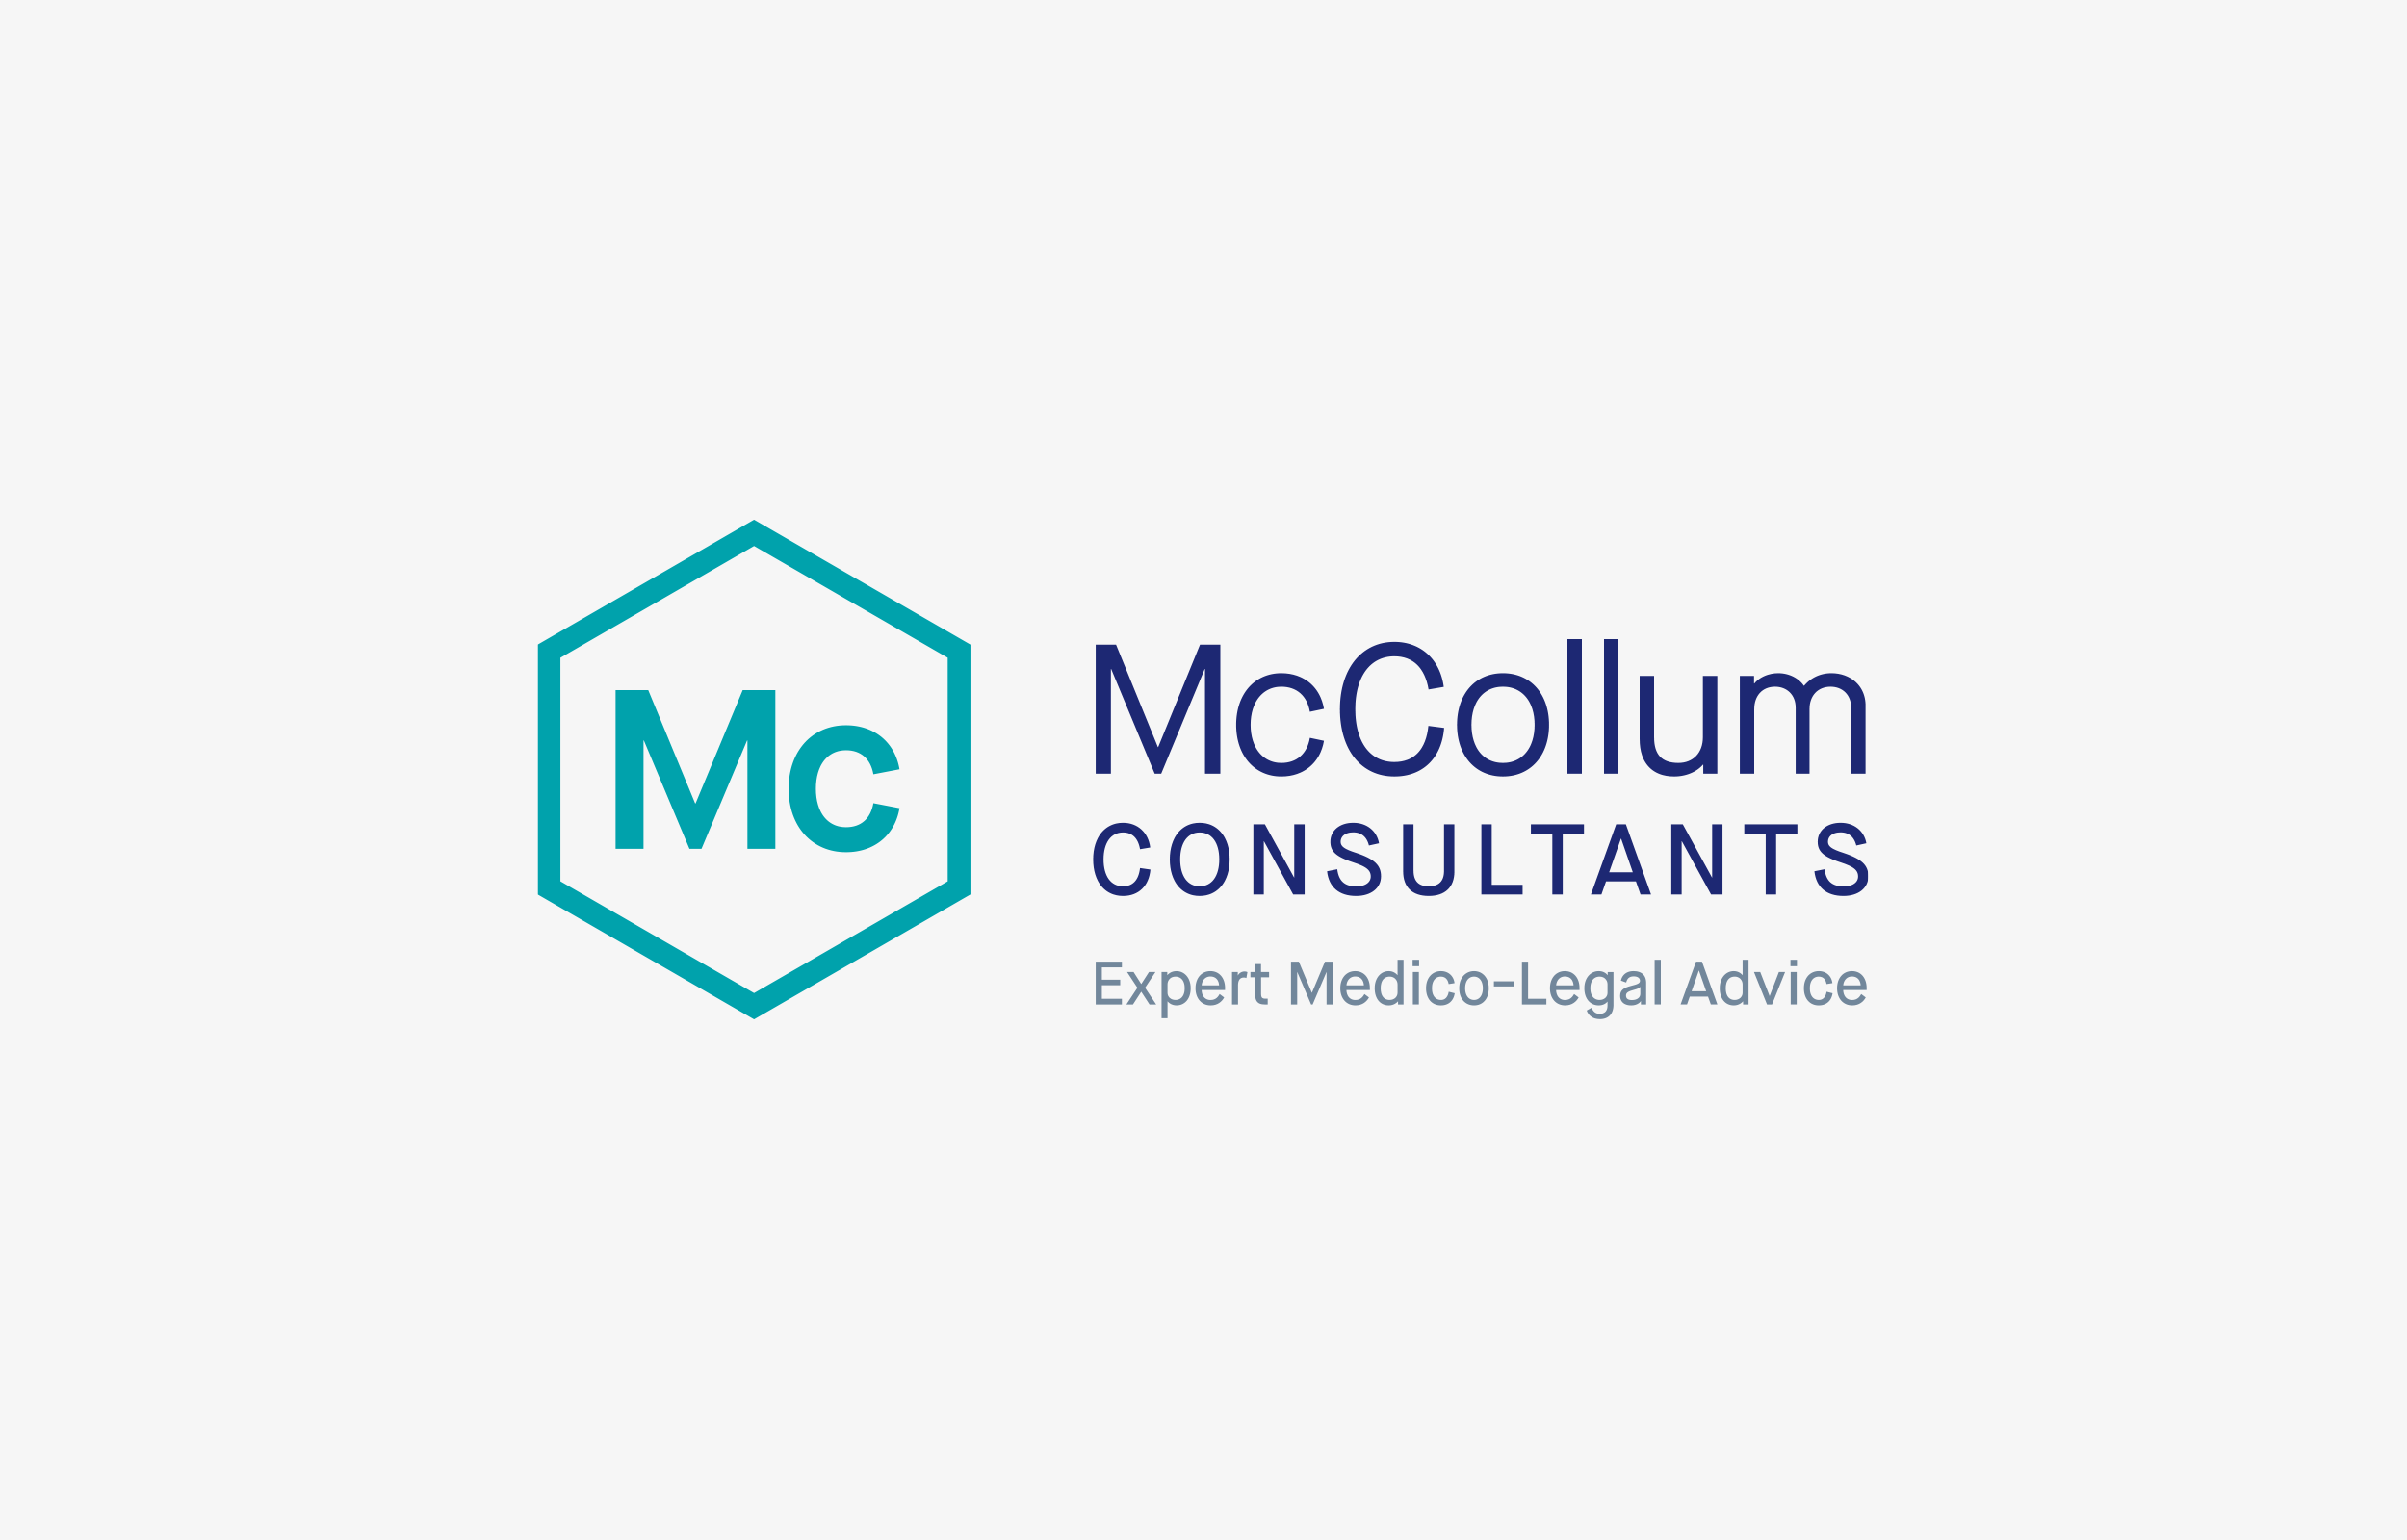 McCollum-Consultants-Logo-G.png